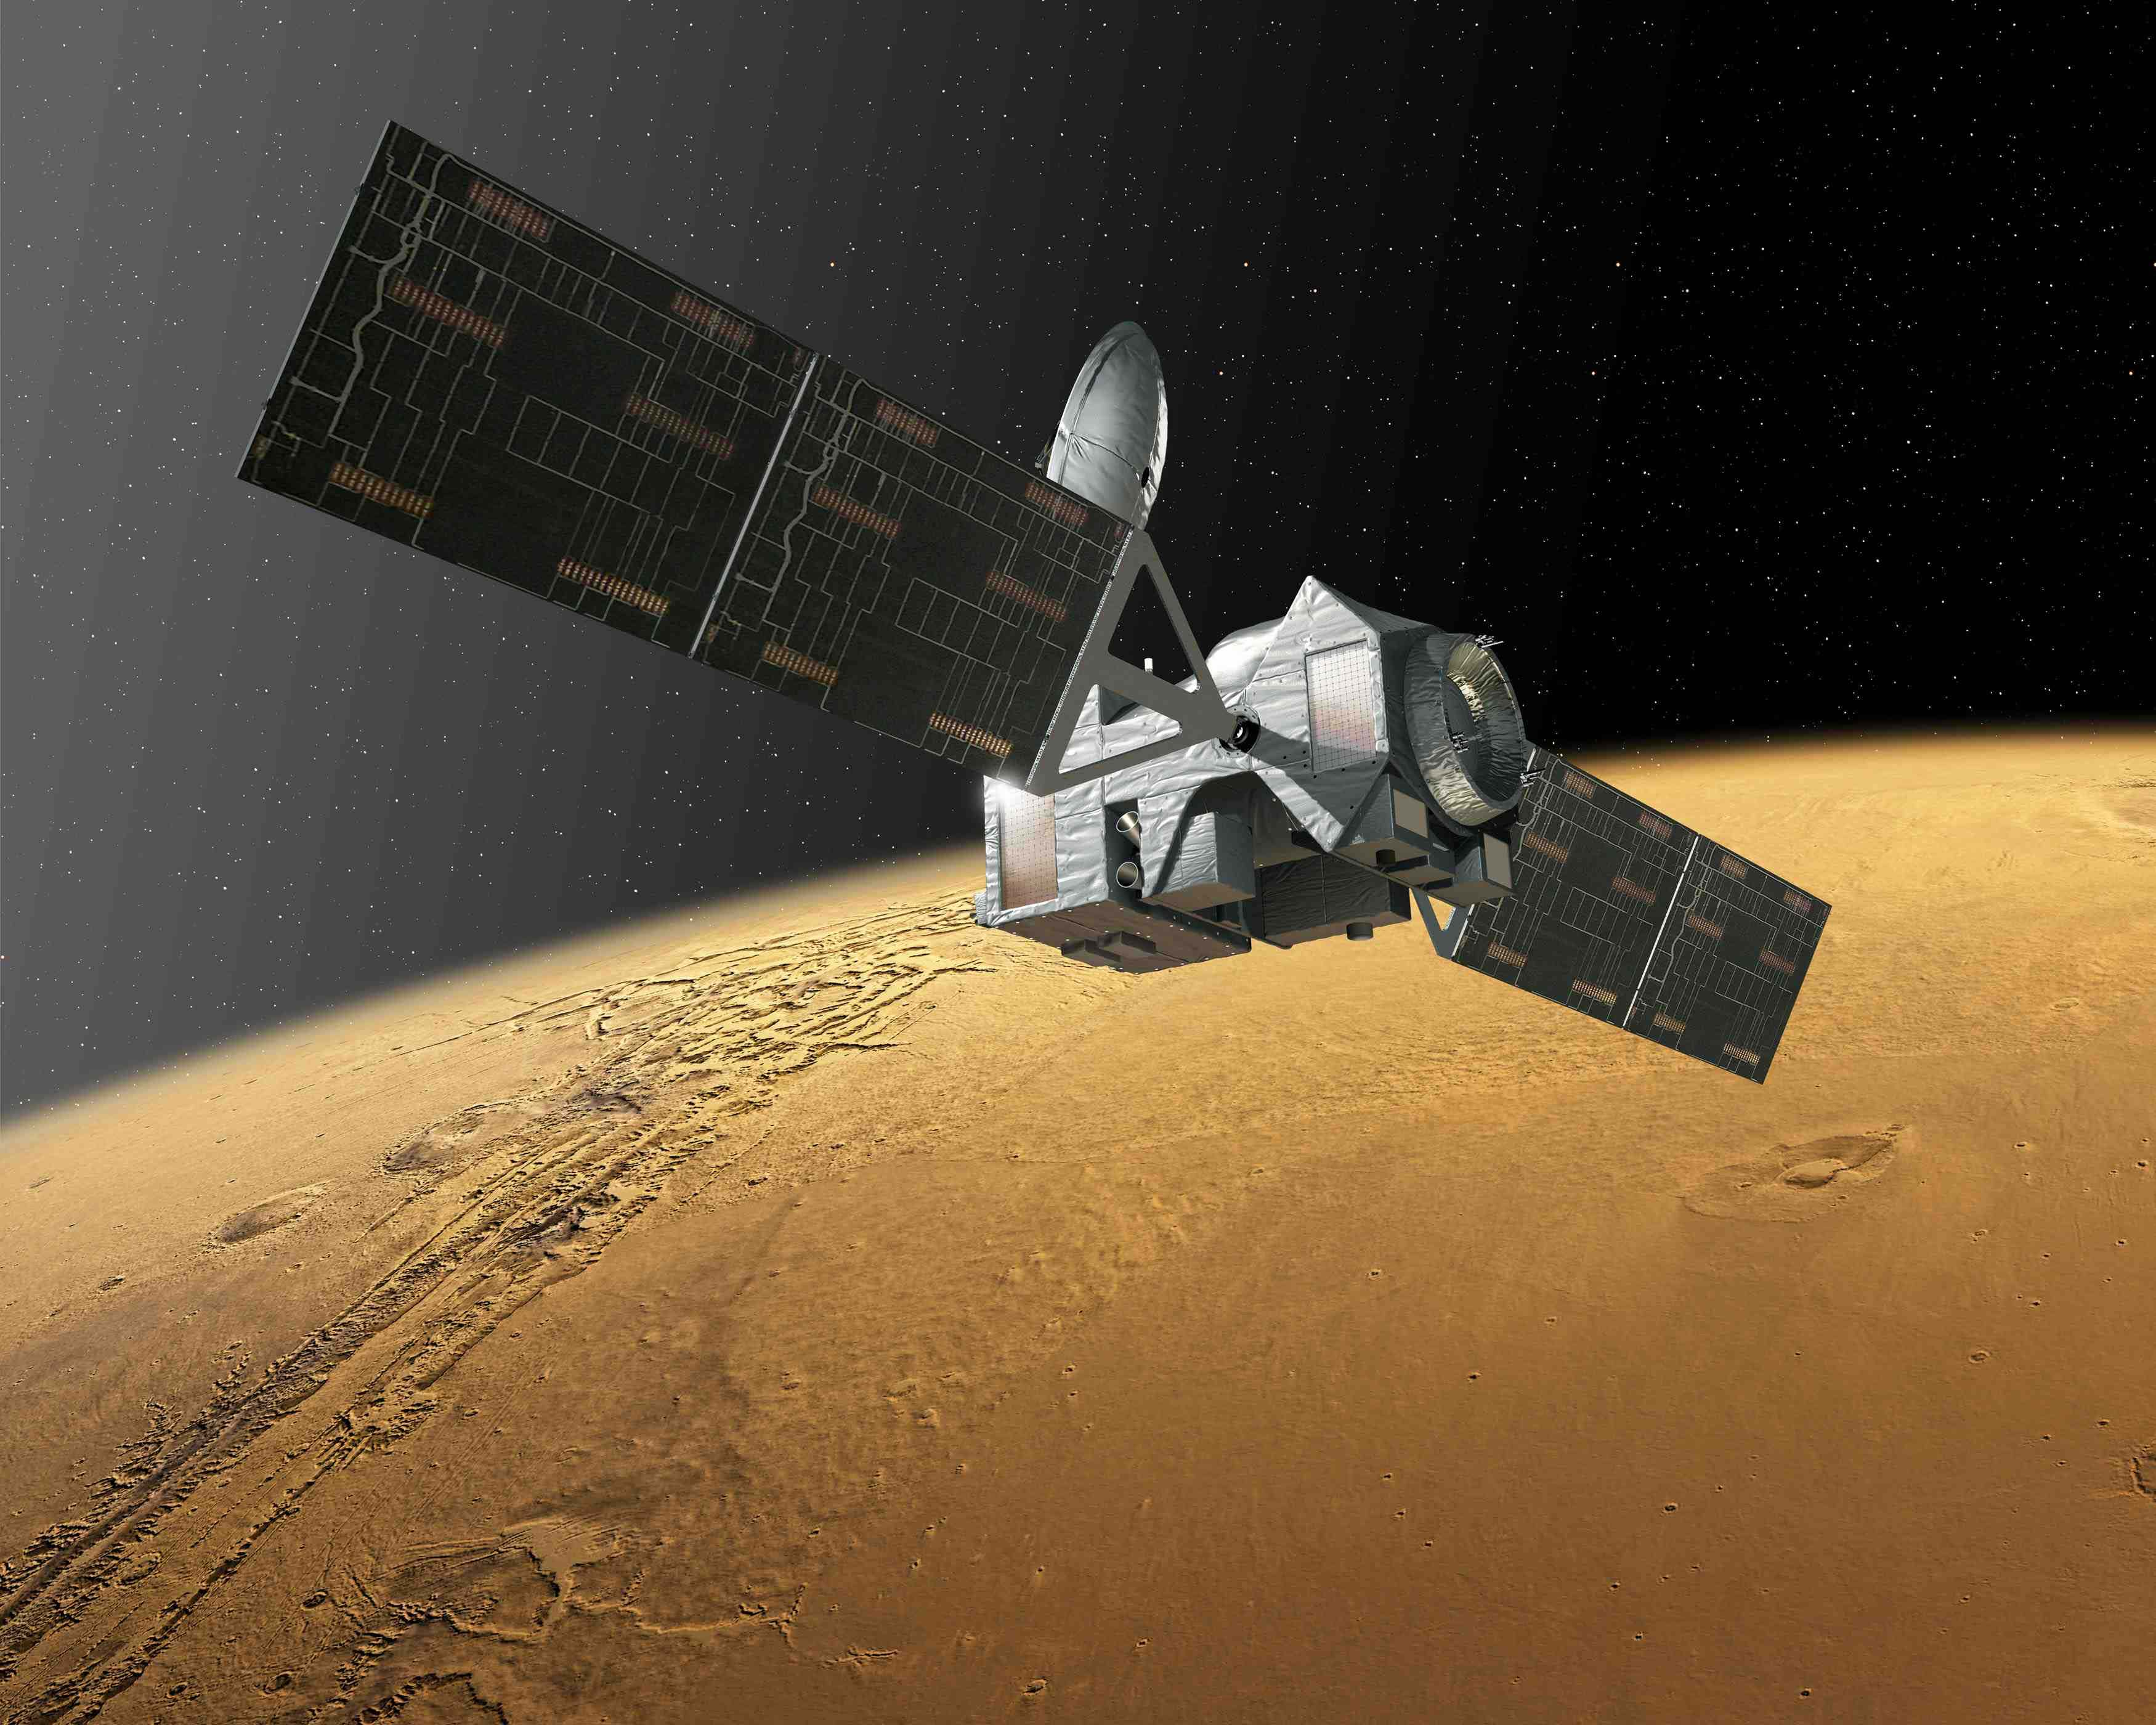 La sonde TGO de l'ESA, en orbite autour de Mars (vue d'artiste)